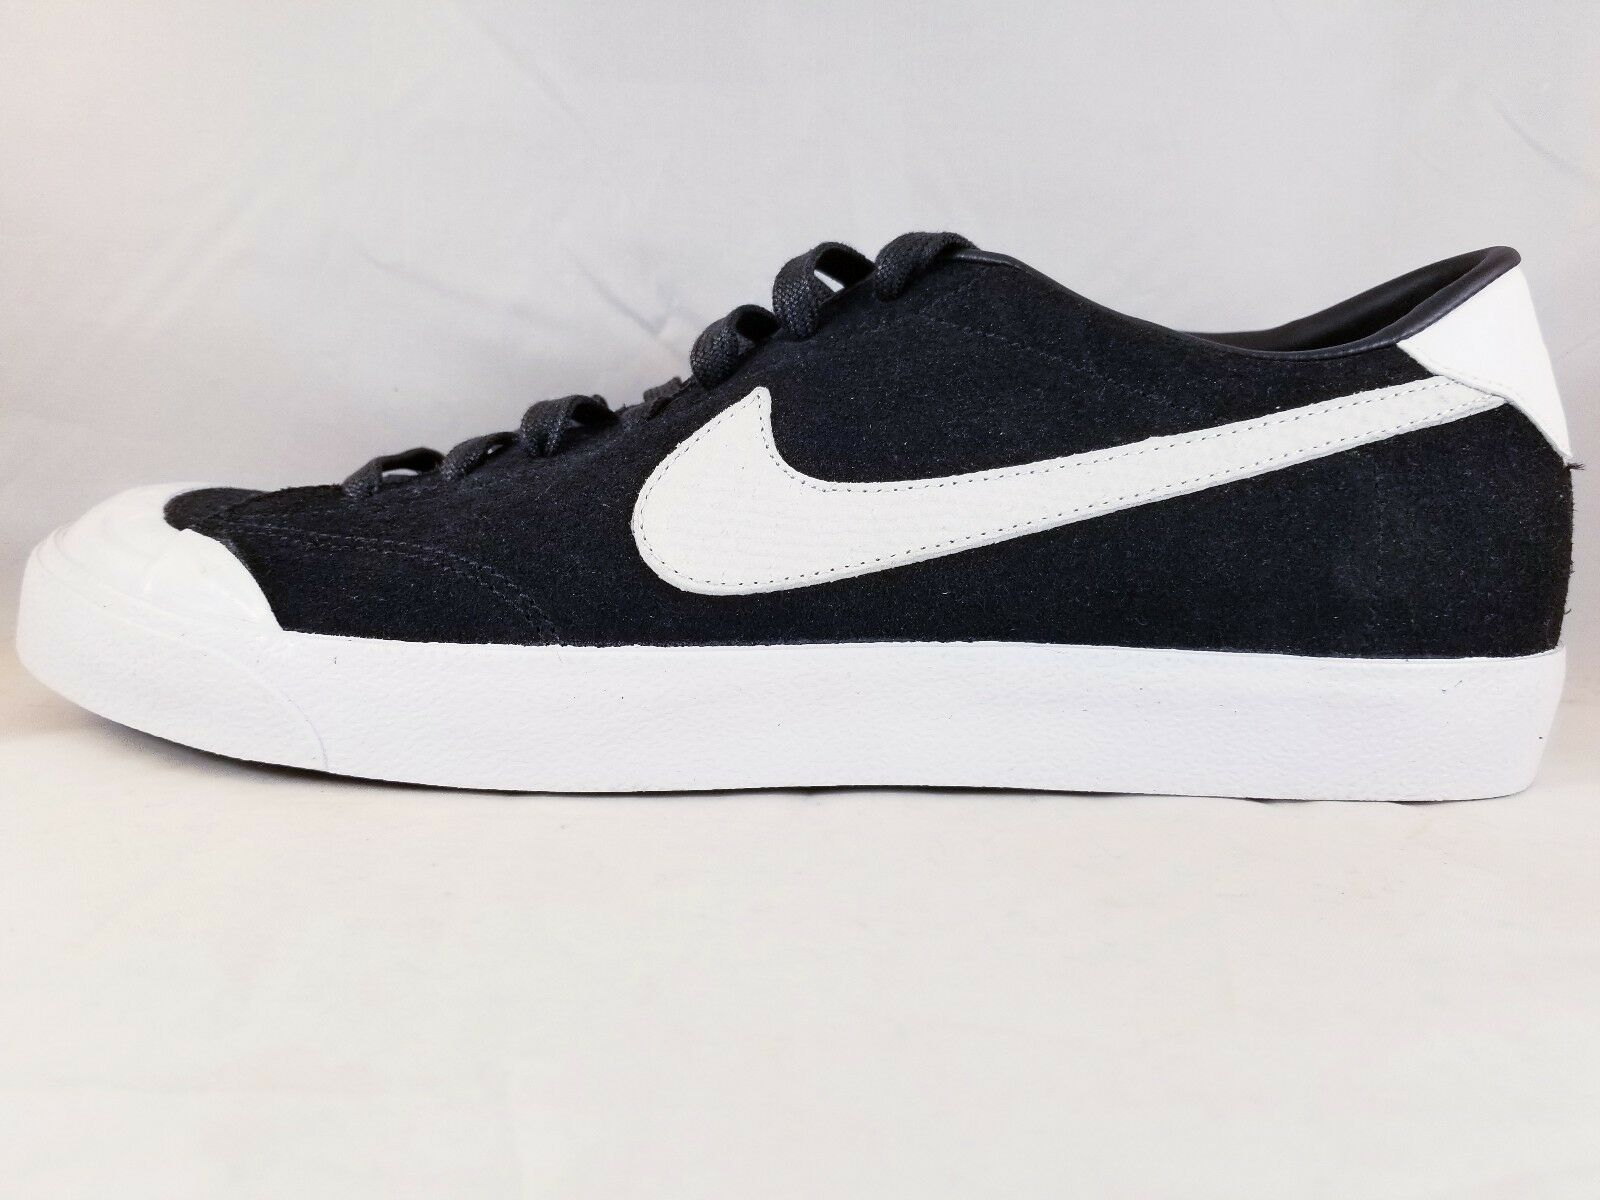 Nike Zoom All Court CK QS Men's Skateboarding Shoe 811252 001 Size 12